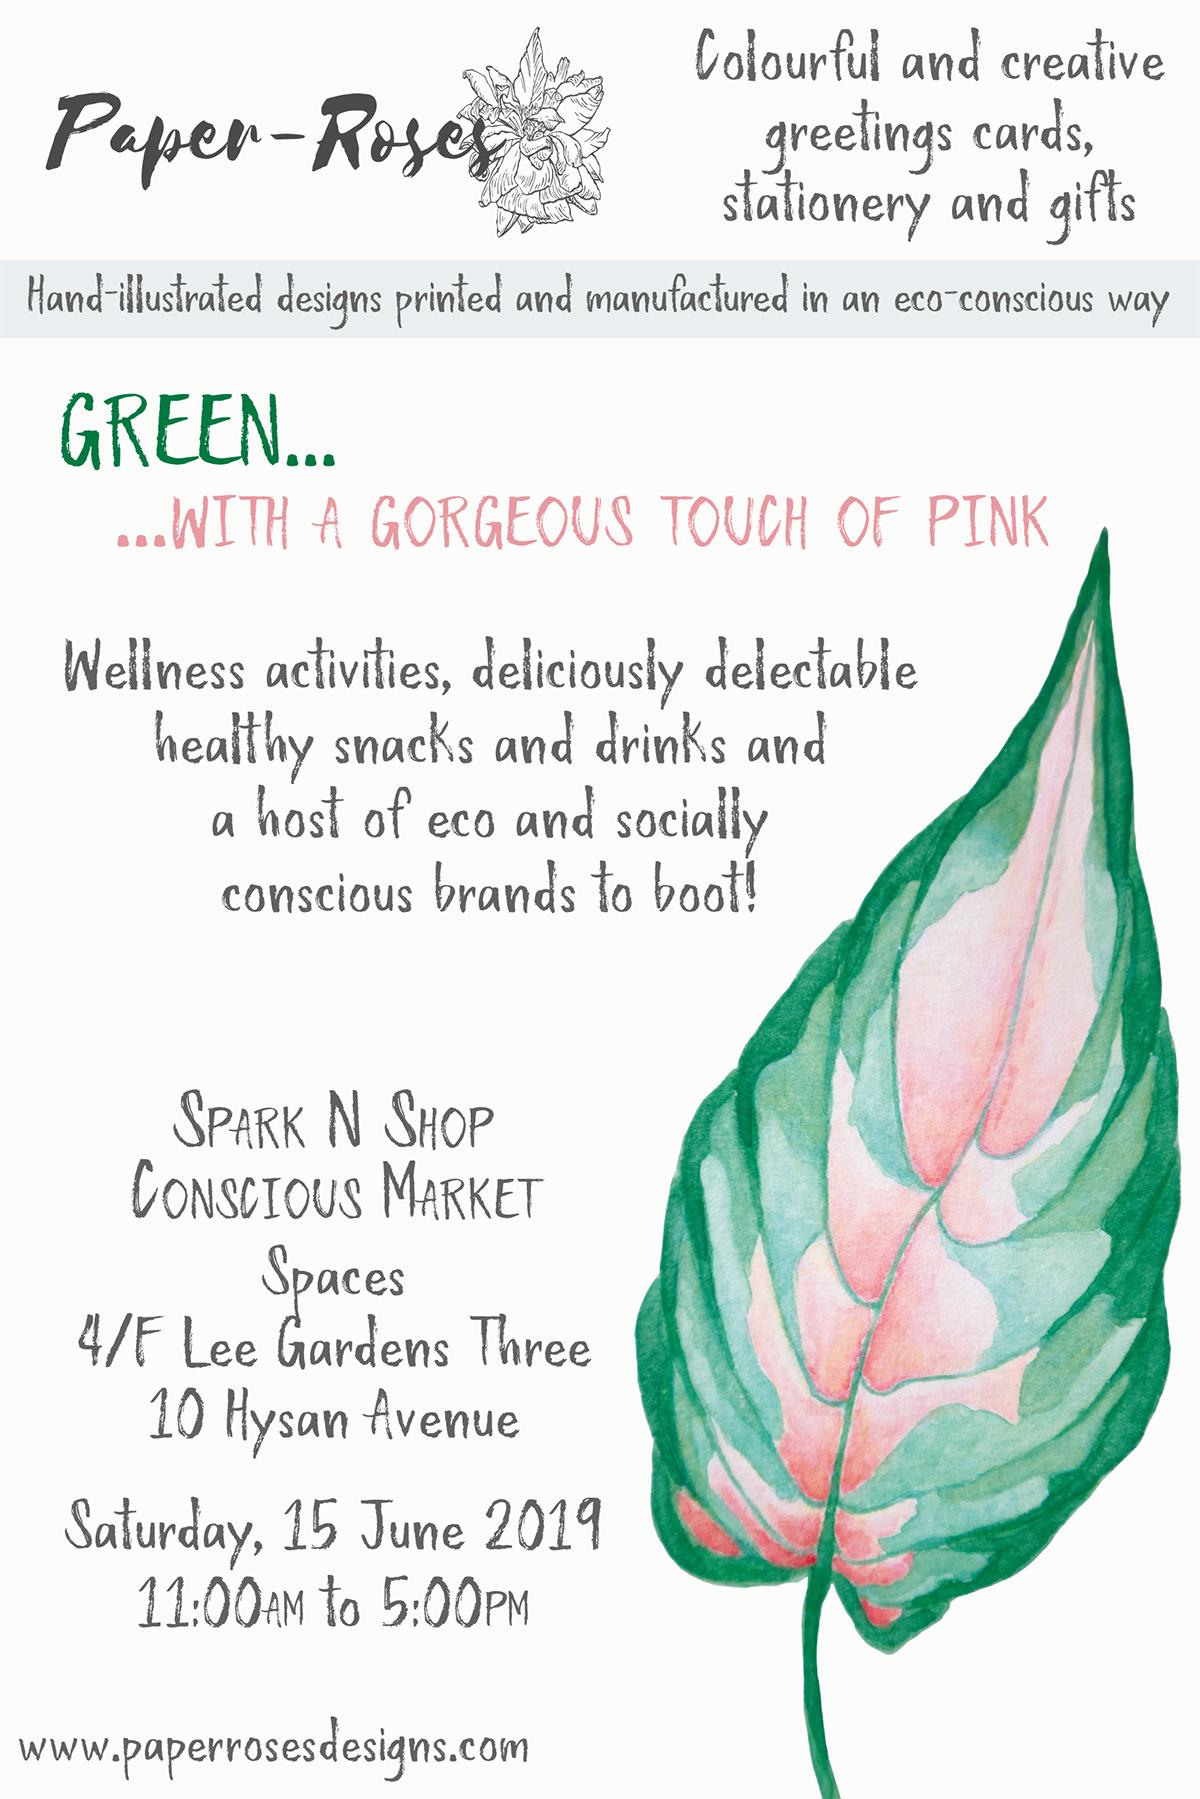 Paper-Roses | Events | Spark'n'Shop Conscious Market | 15 June 2019